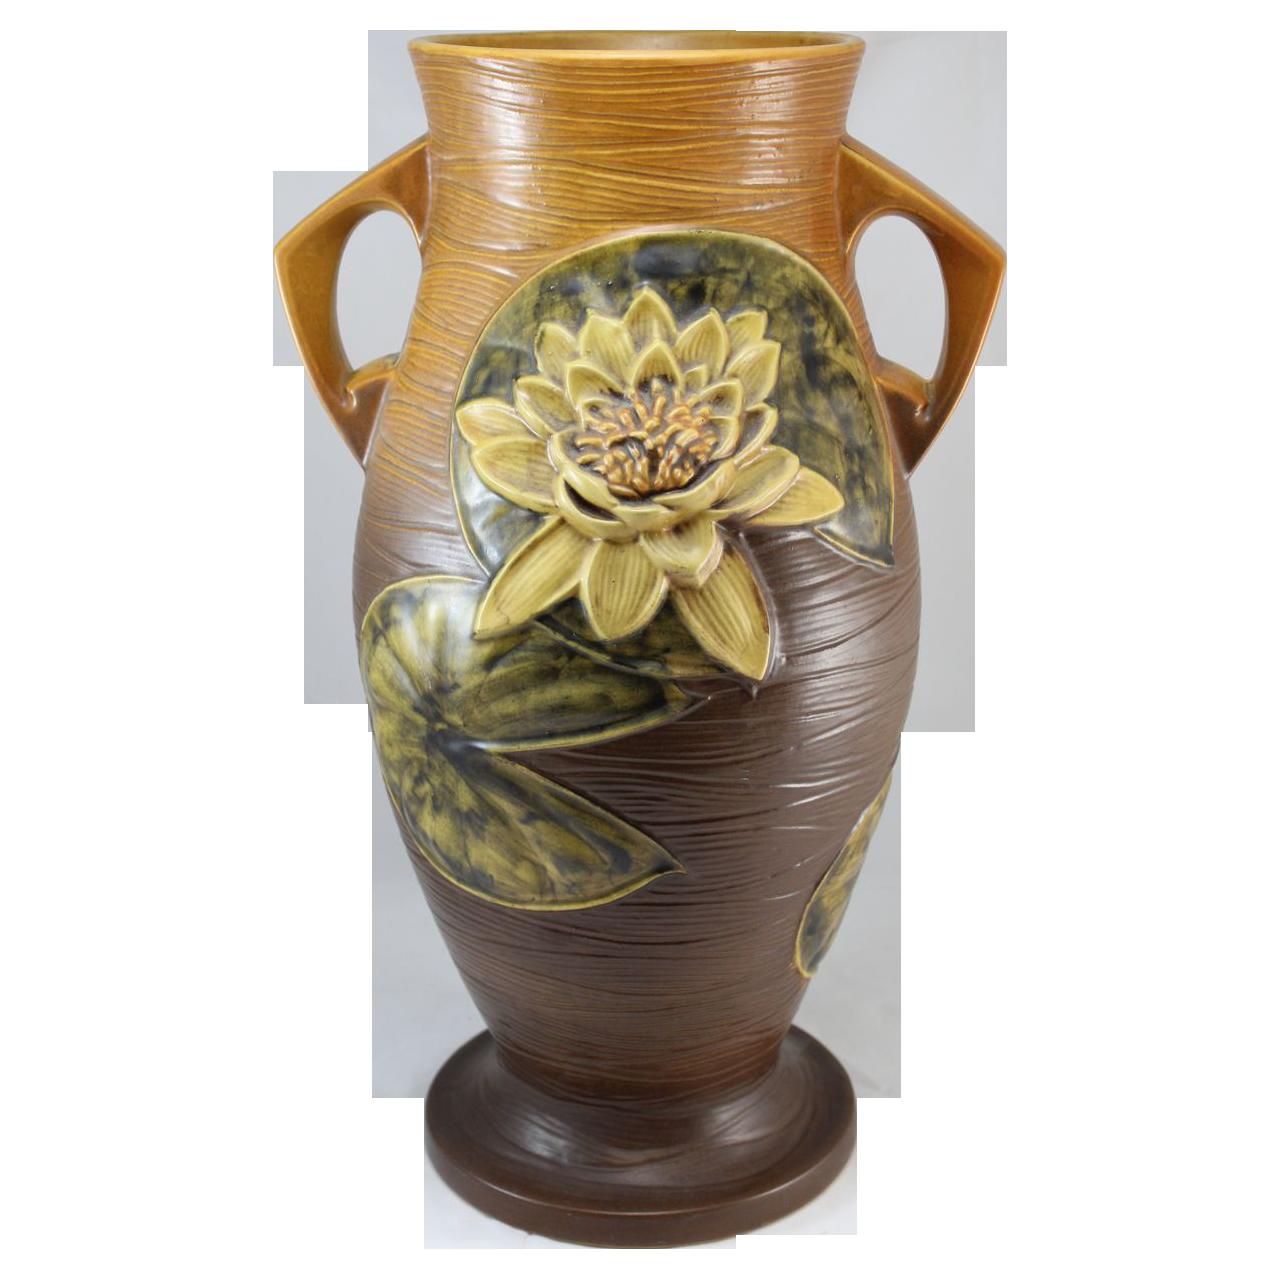 "Roseville Water Lily 85-18"" Floor Vase From Nhantiquecoop"